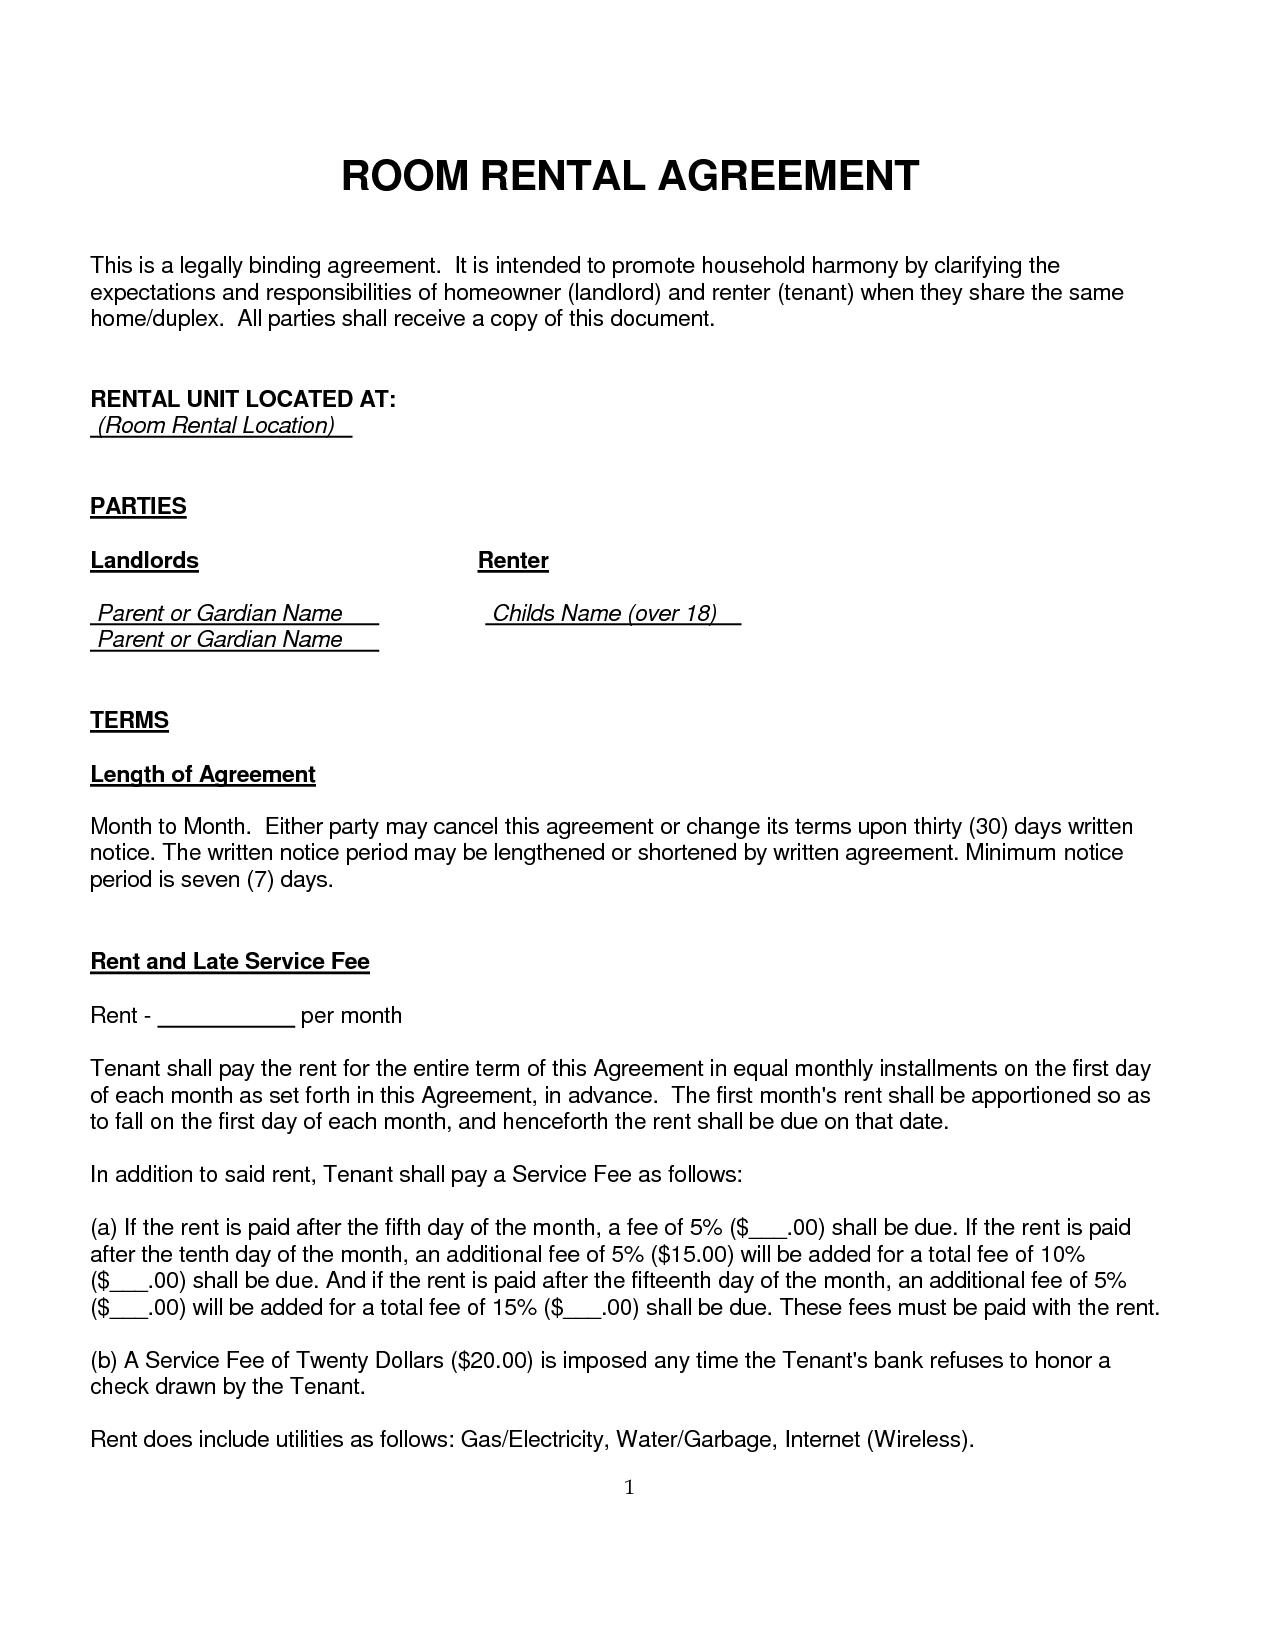 Room Rental Agreement Rental Agreement Templates Rental